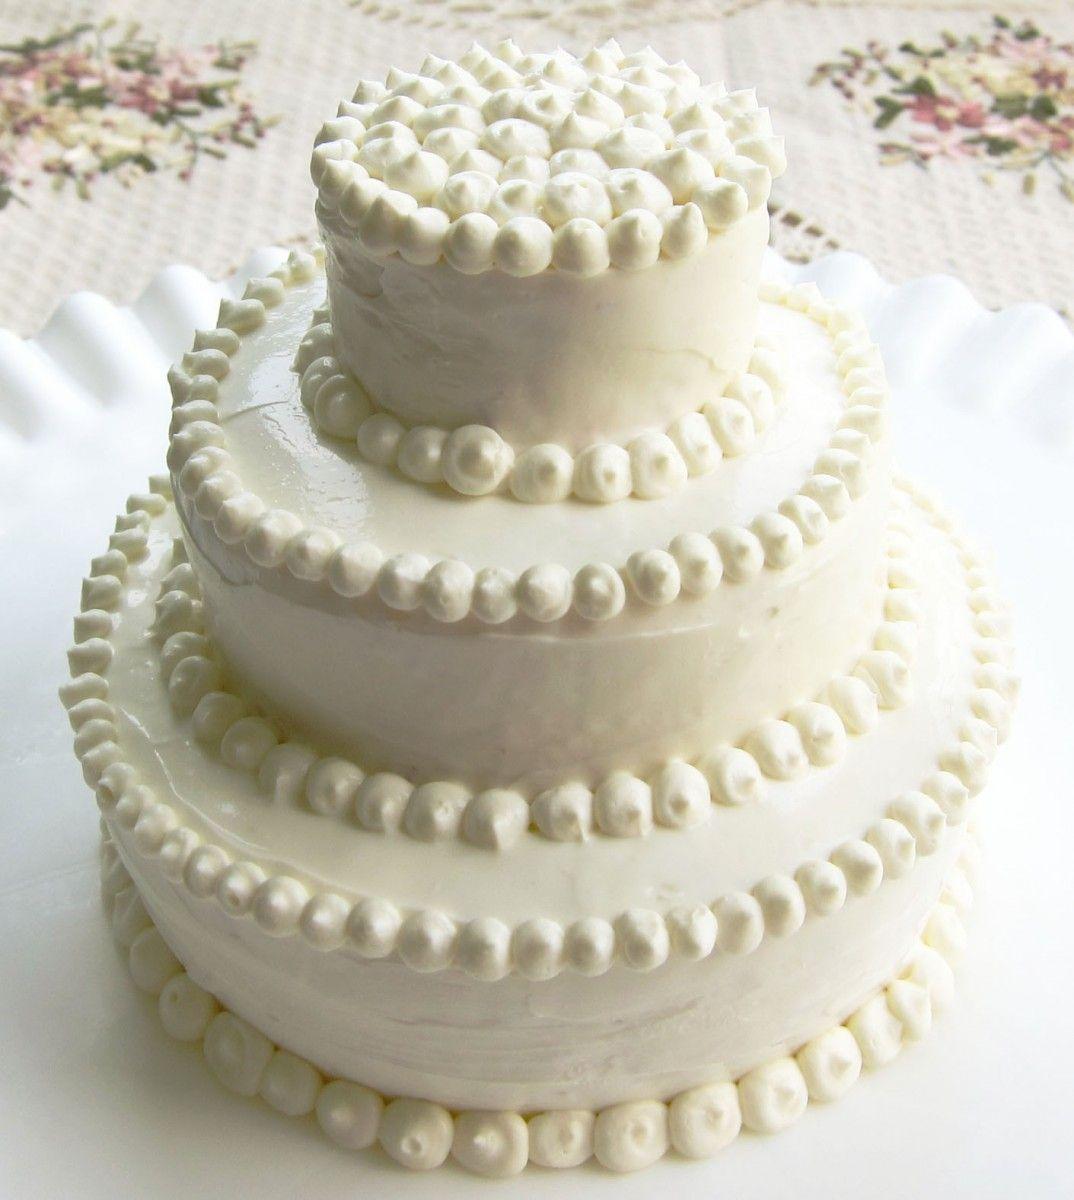 Wedding Cake Alternatives Cheese Wheel Cakes Galore Wedding